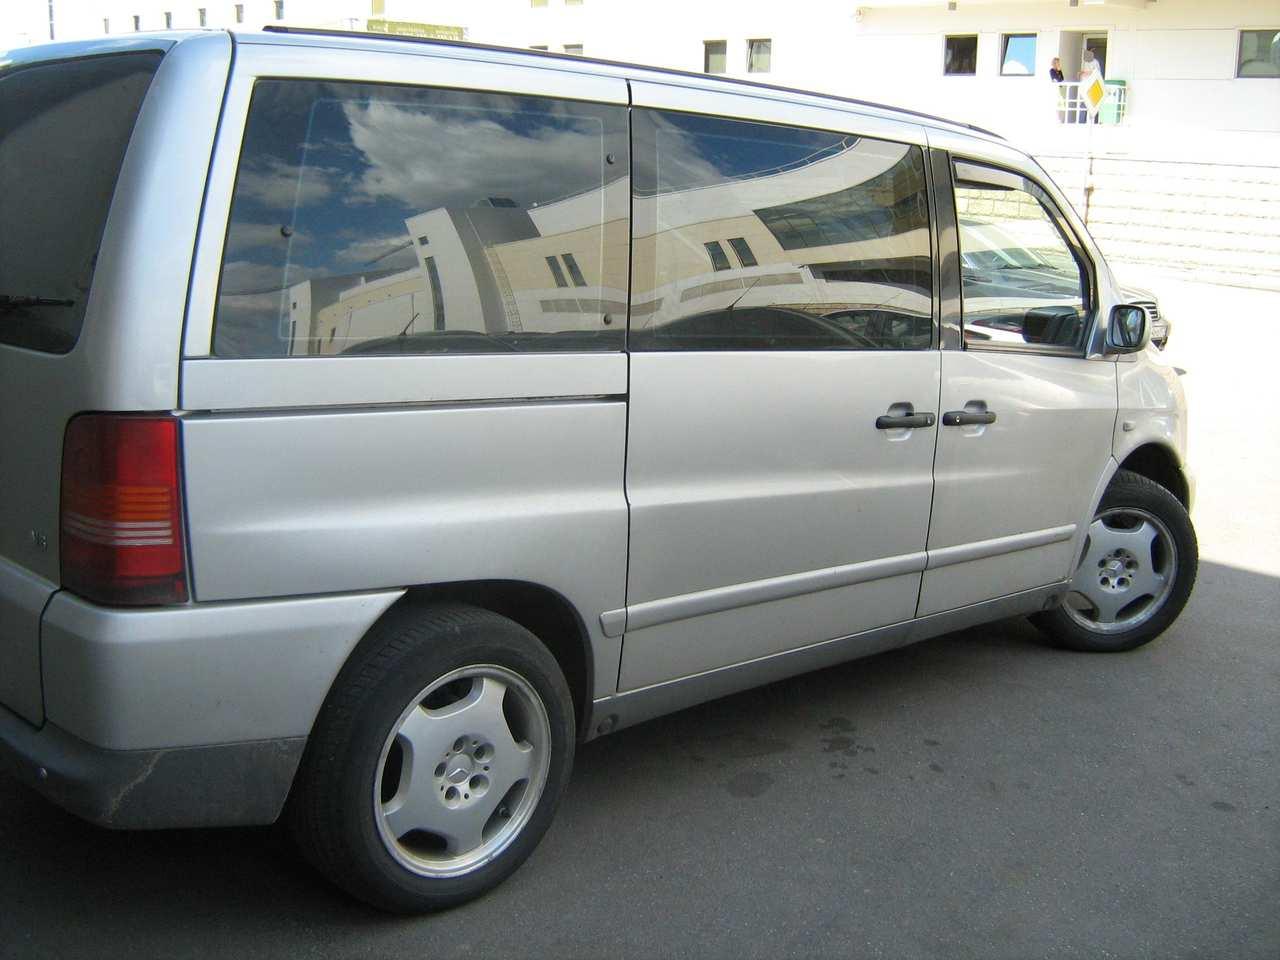 Used 1998 mercedes benz vito photos 2800cc gasoline ff for Mercedes benz vito for sale